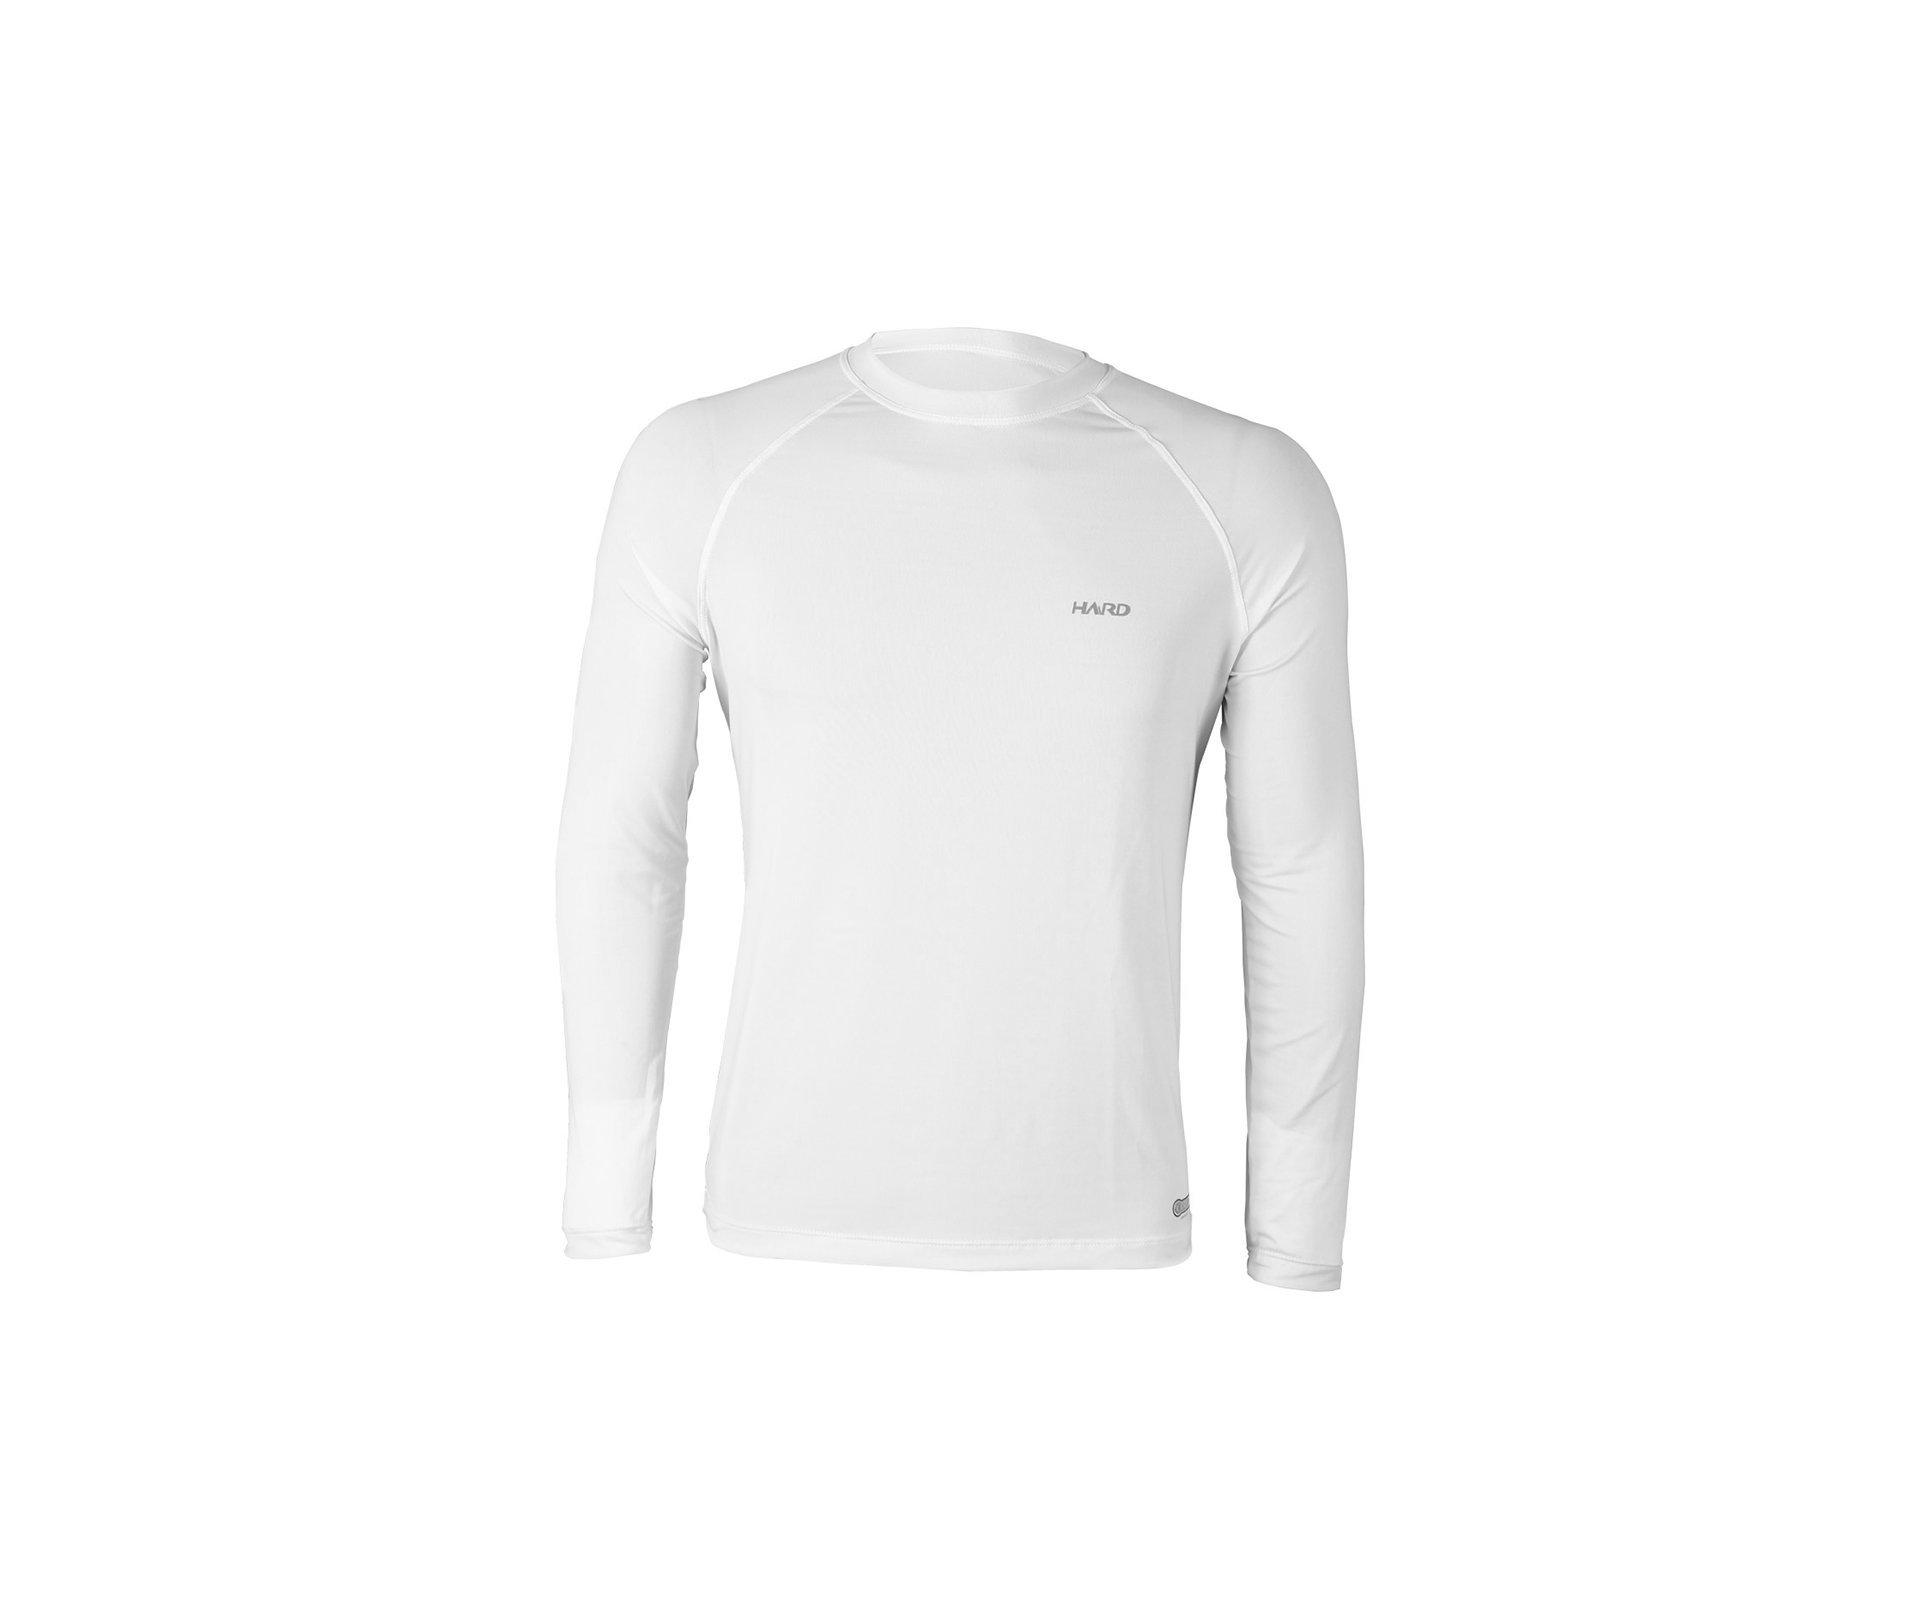 Camiseta Nanotec M.longa Fresh50 Branco Leggerissimo - Hard